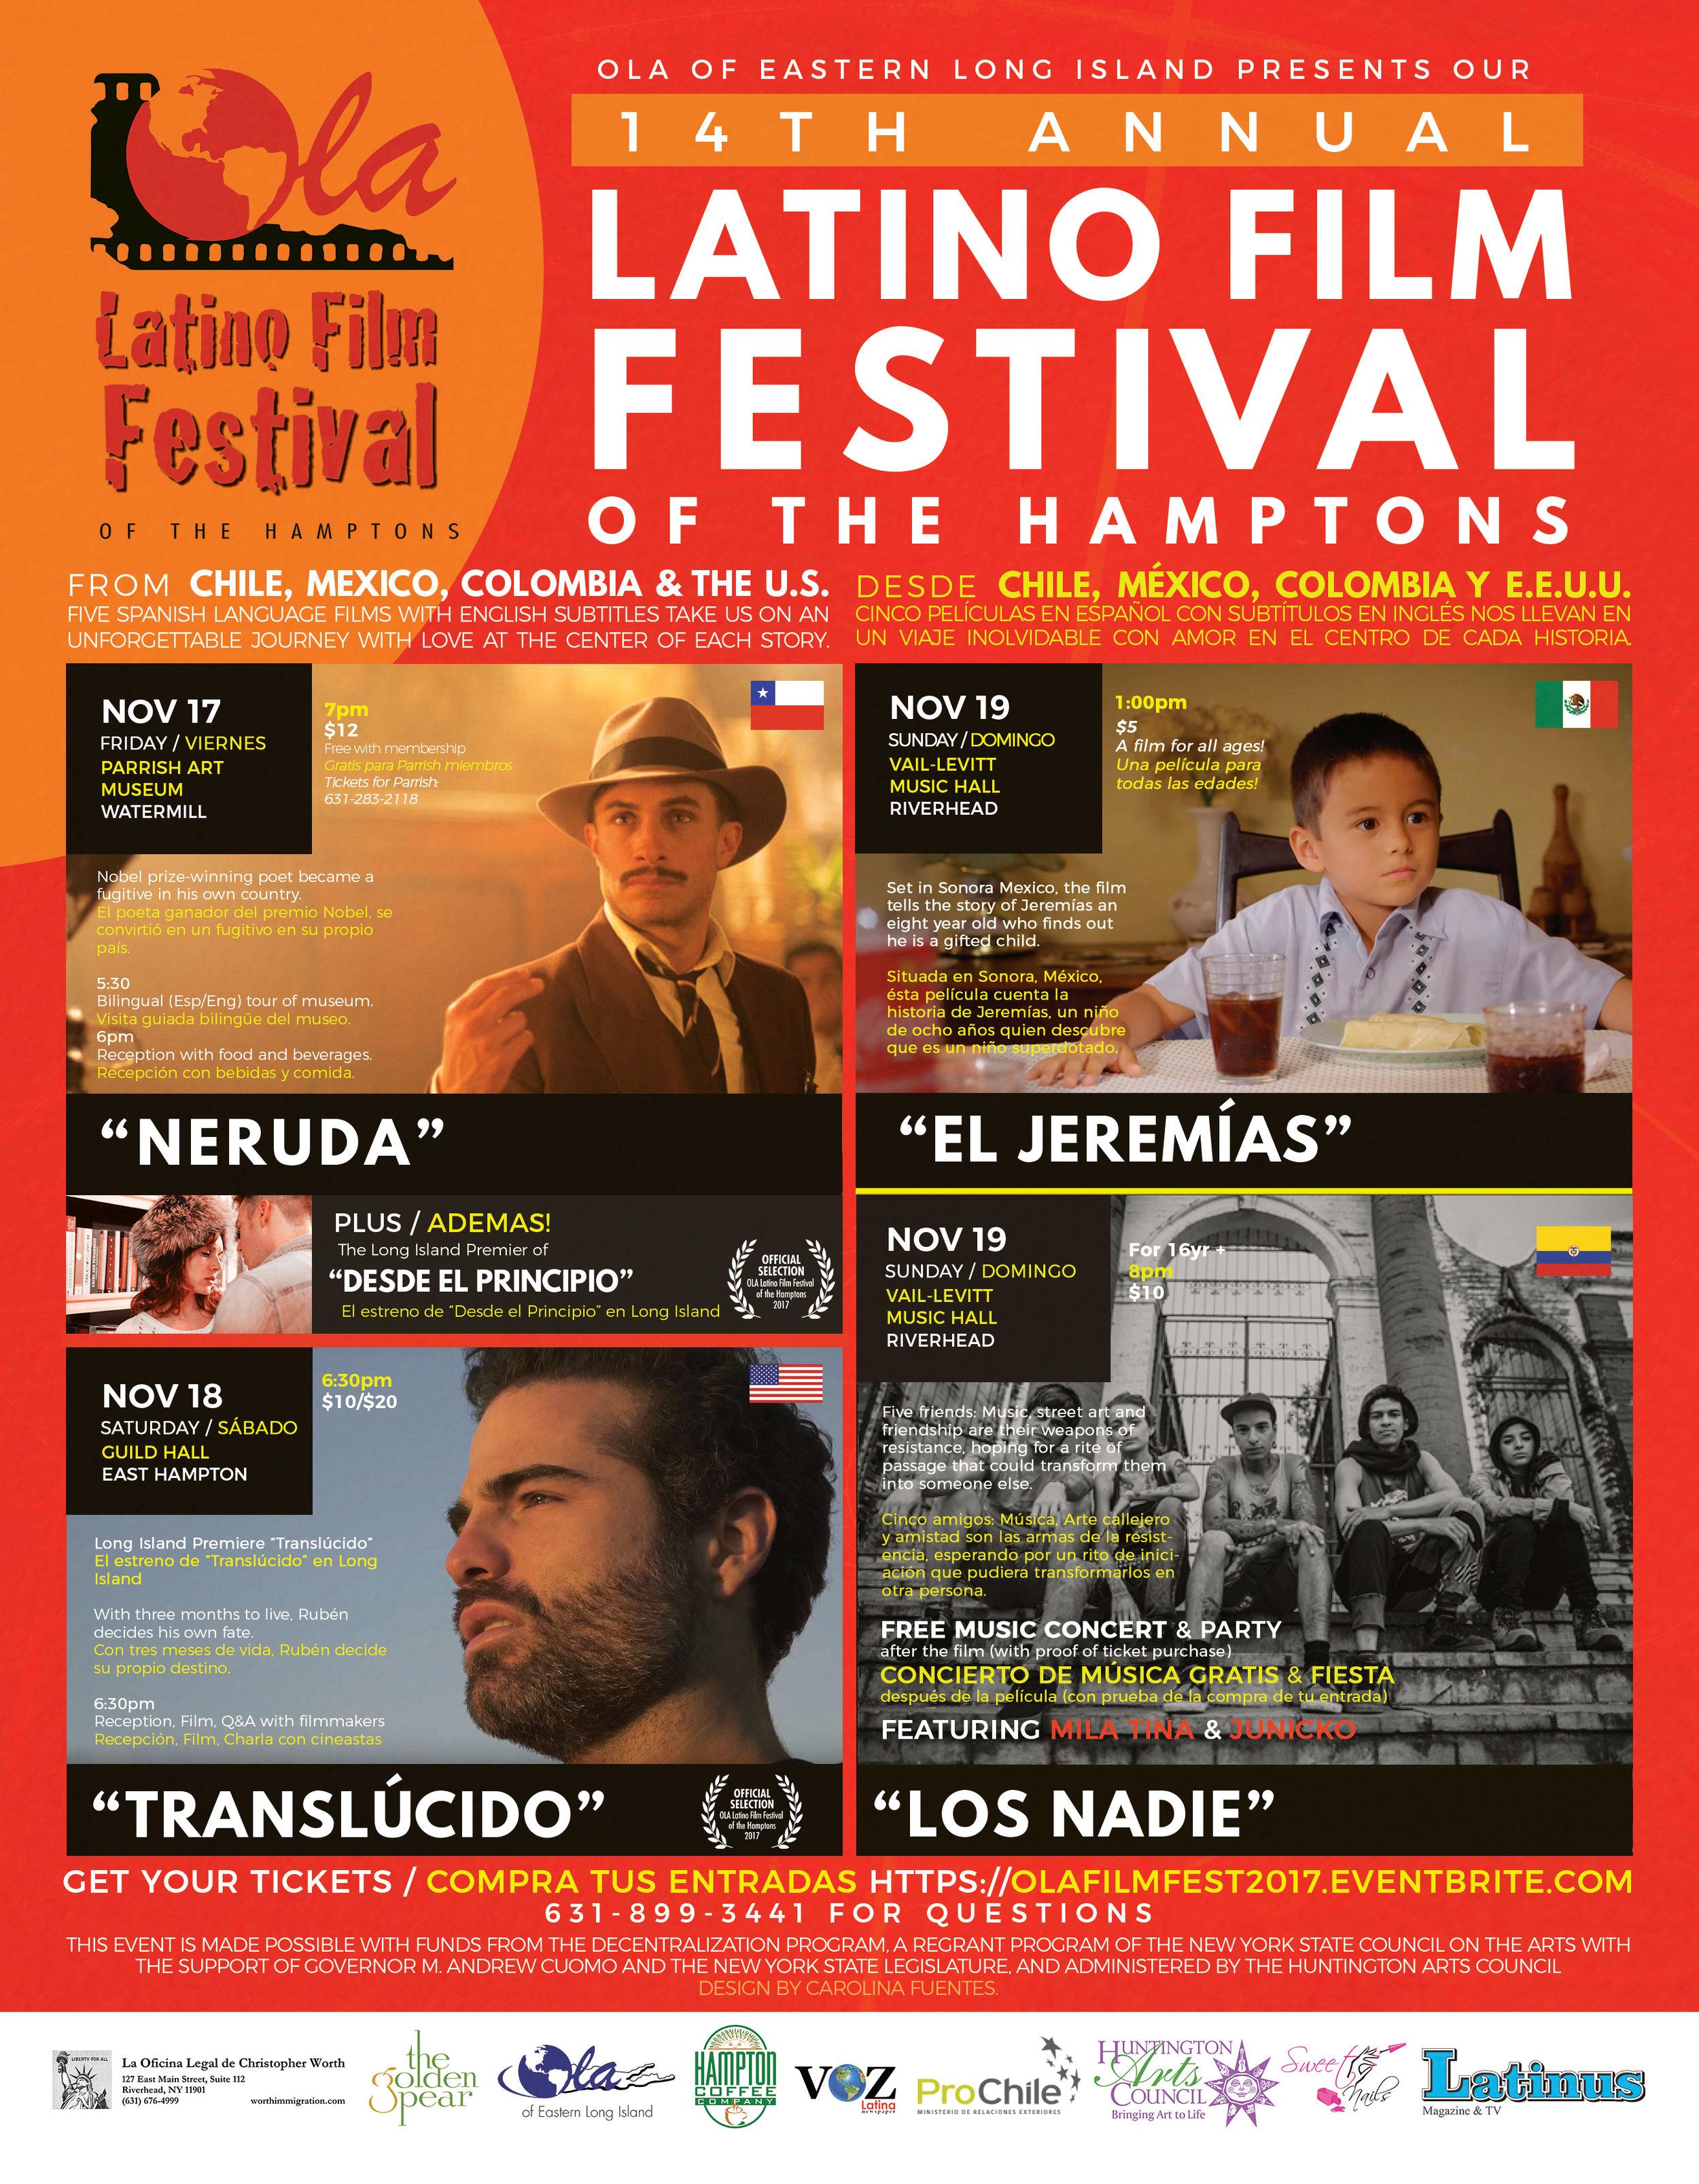 WEB-OLA-film-festival-program-8.5x11-101617-3.jpg